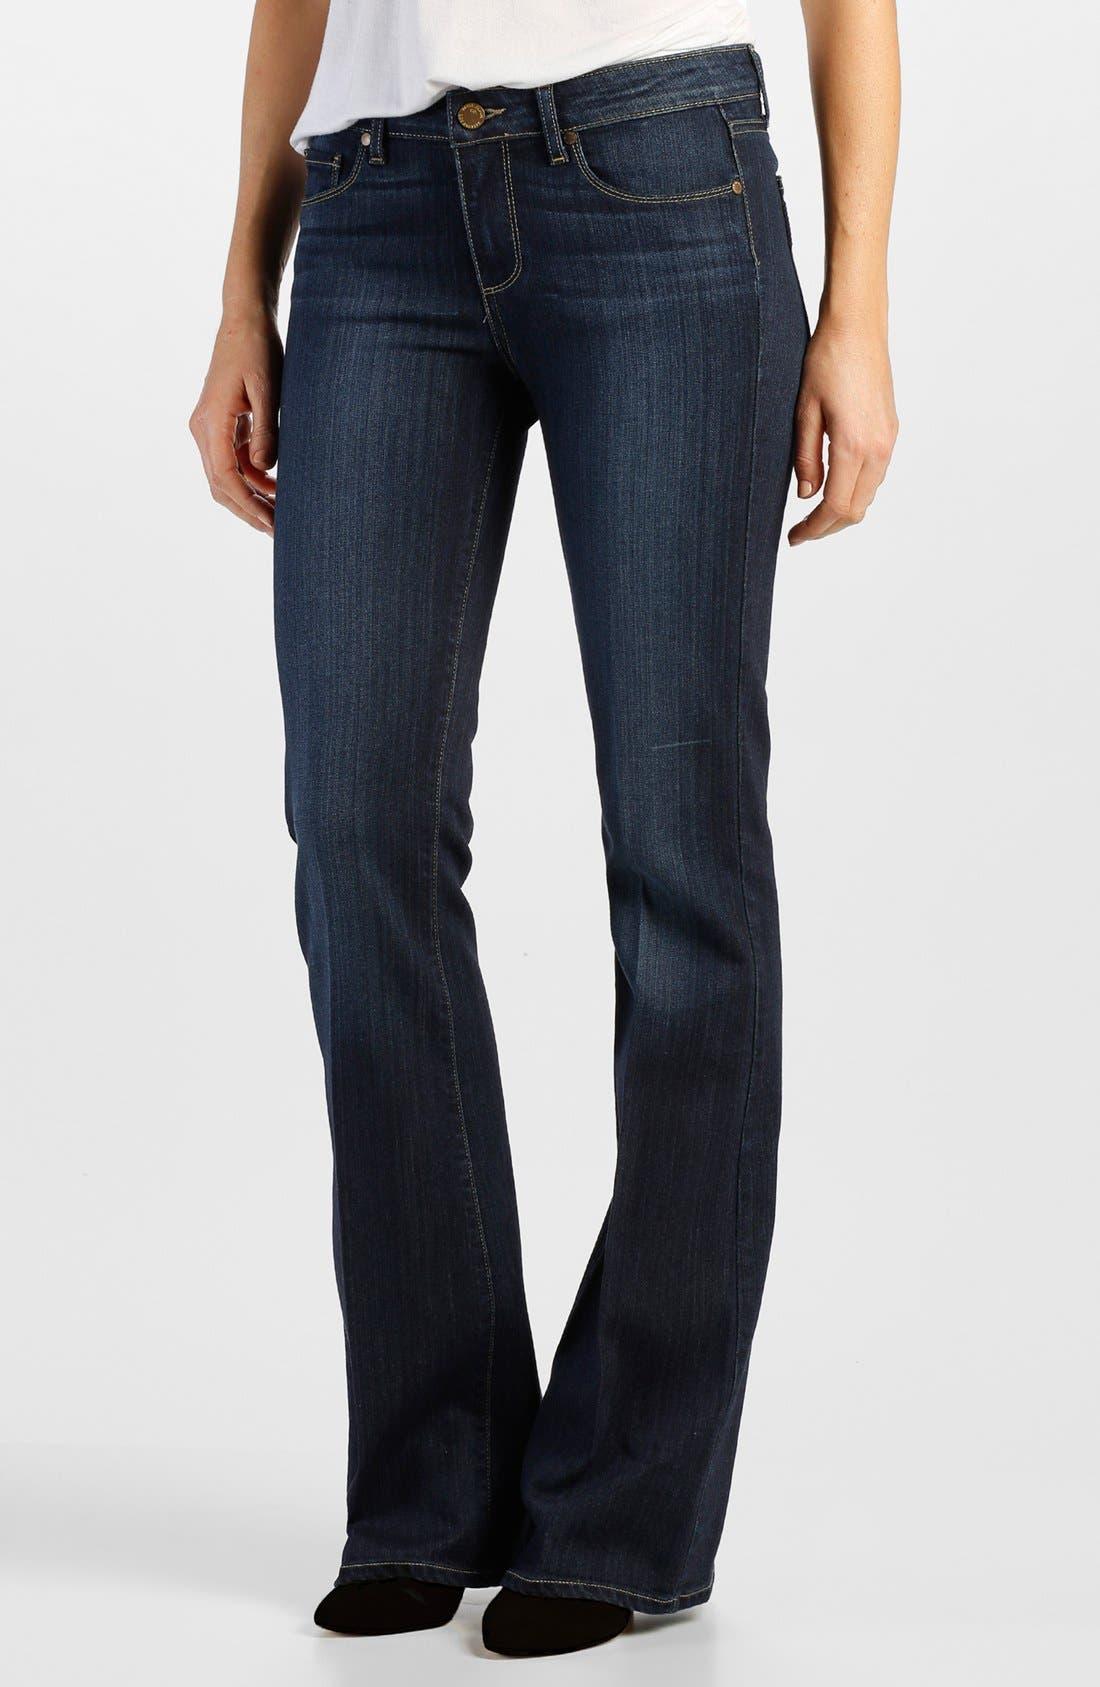 Main Image - Paige Denim 'Skyline' Bootcut Jeans (Alanis)